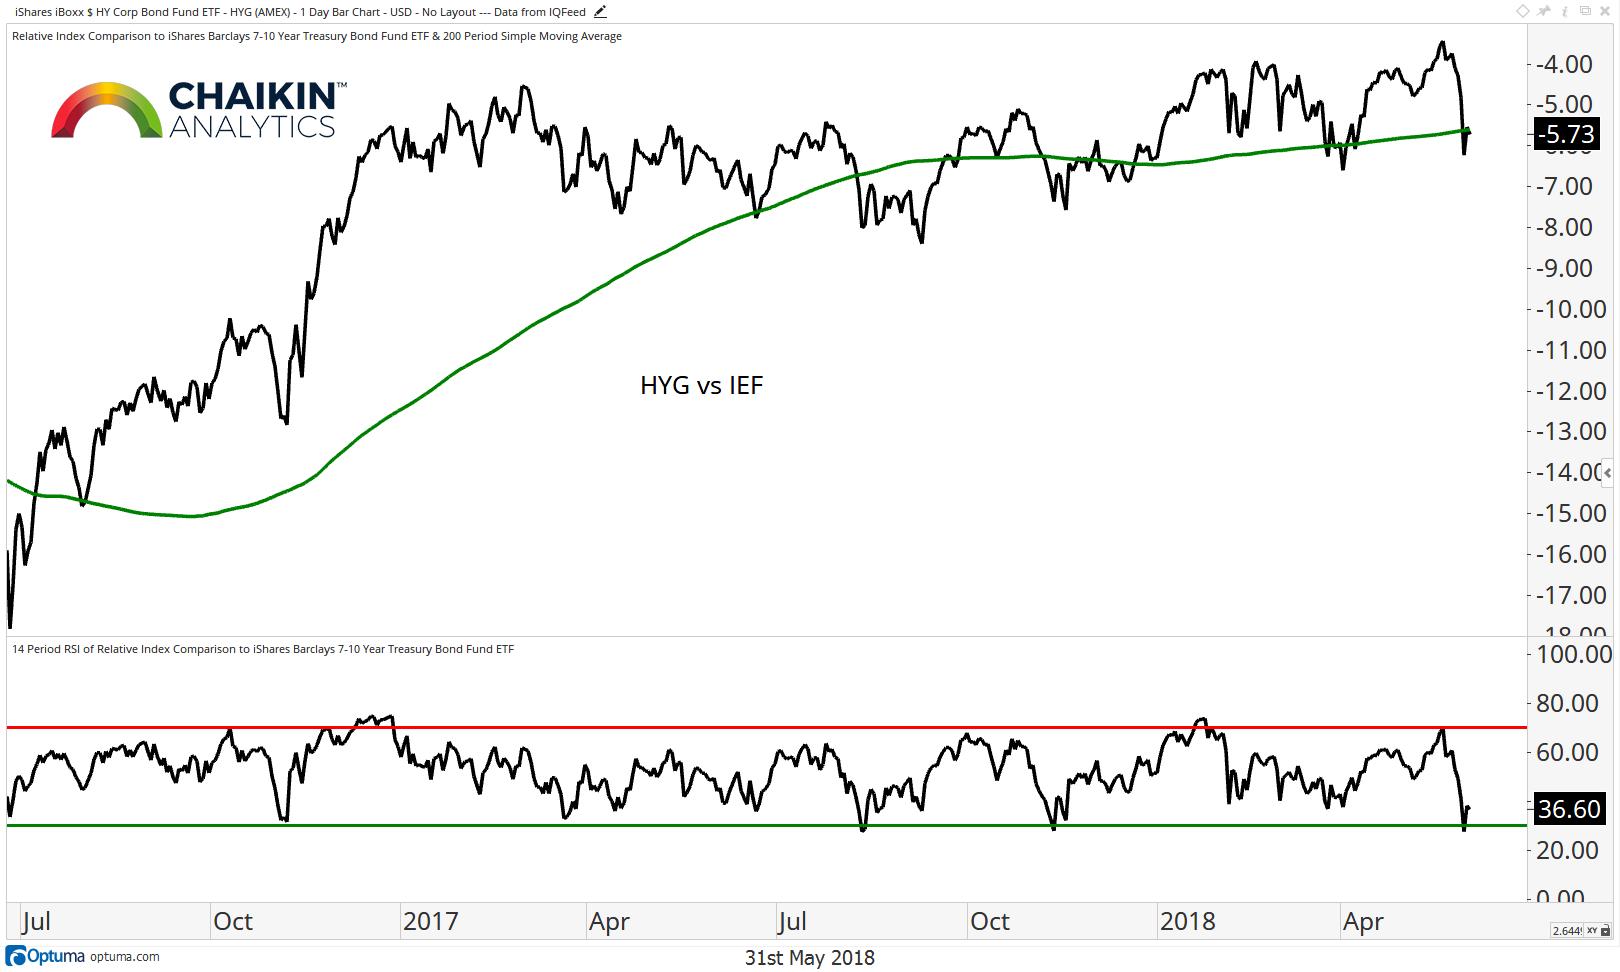 high yield etf hyg bond etf ief relative performance investors year 2018